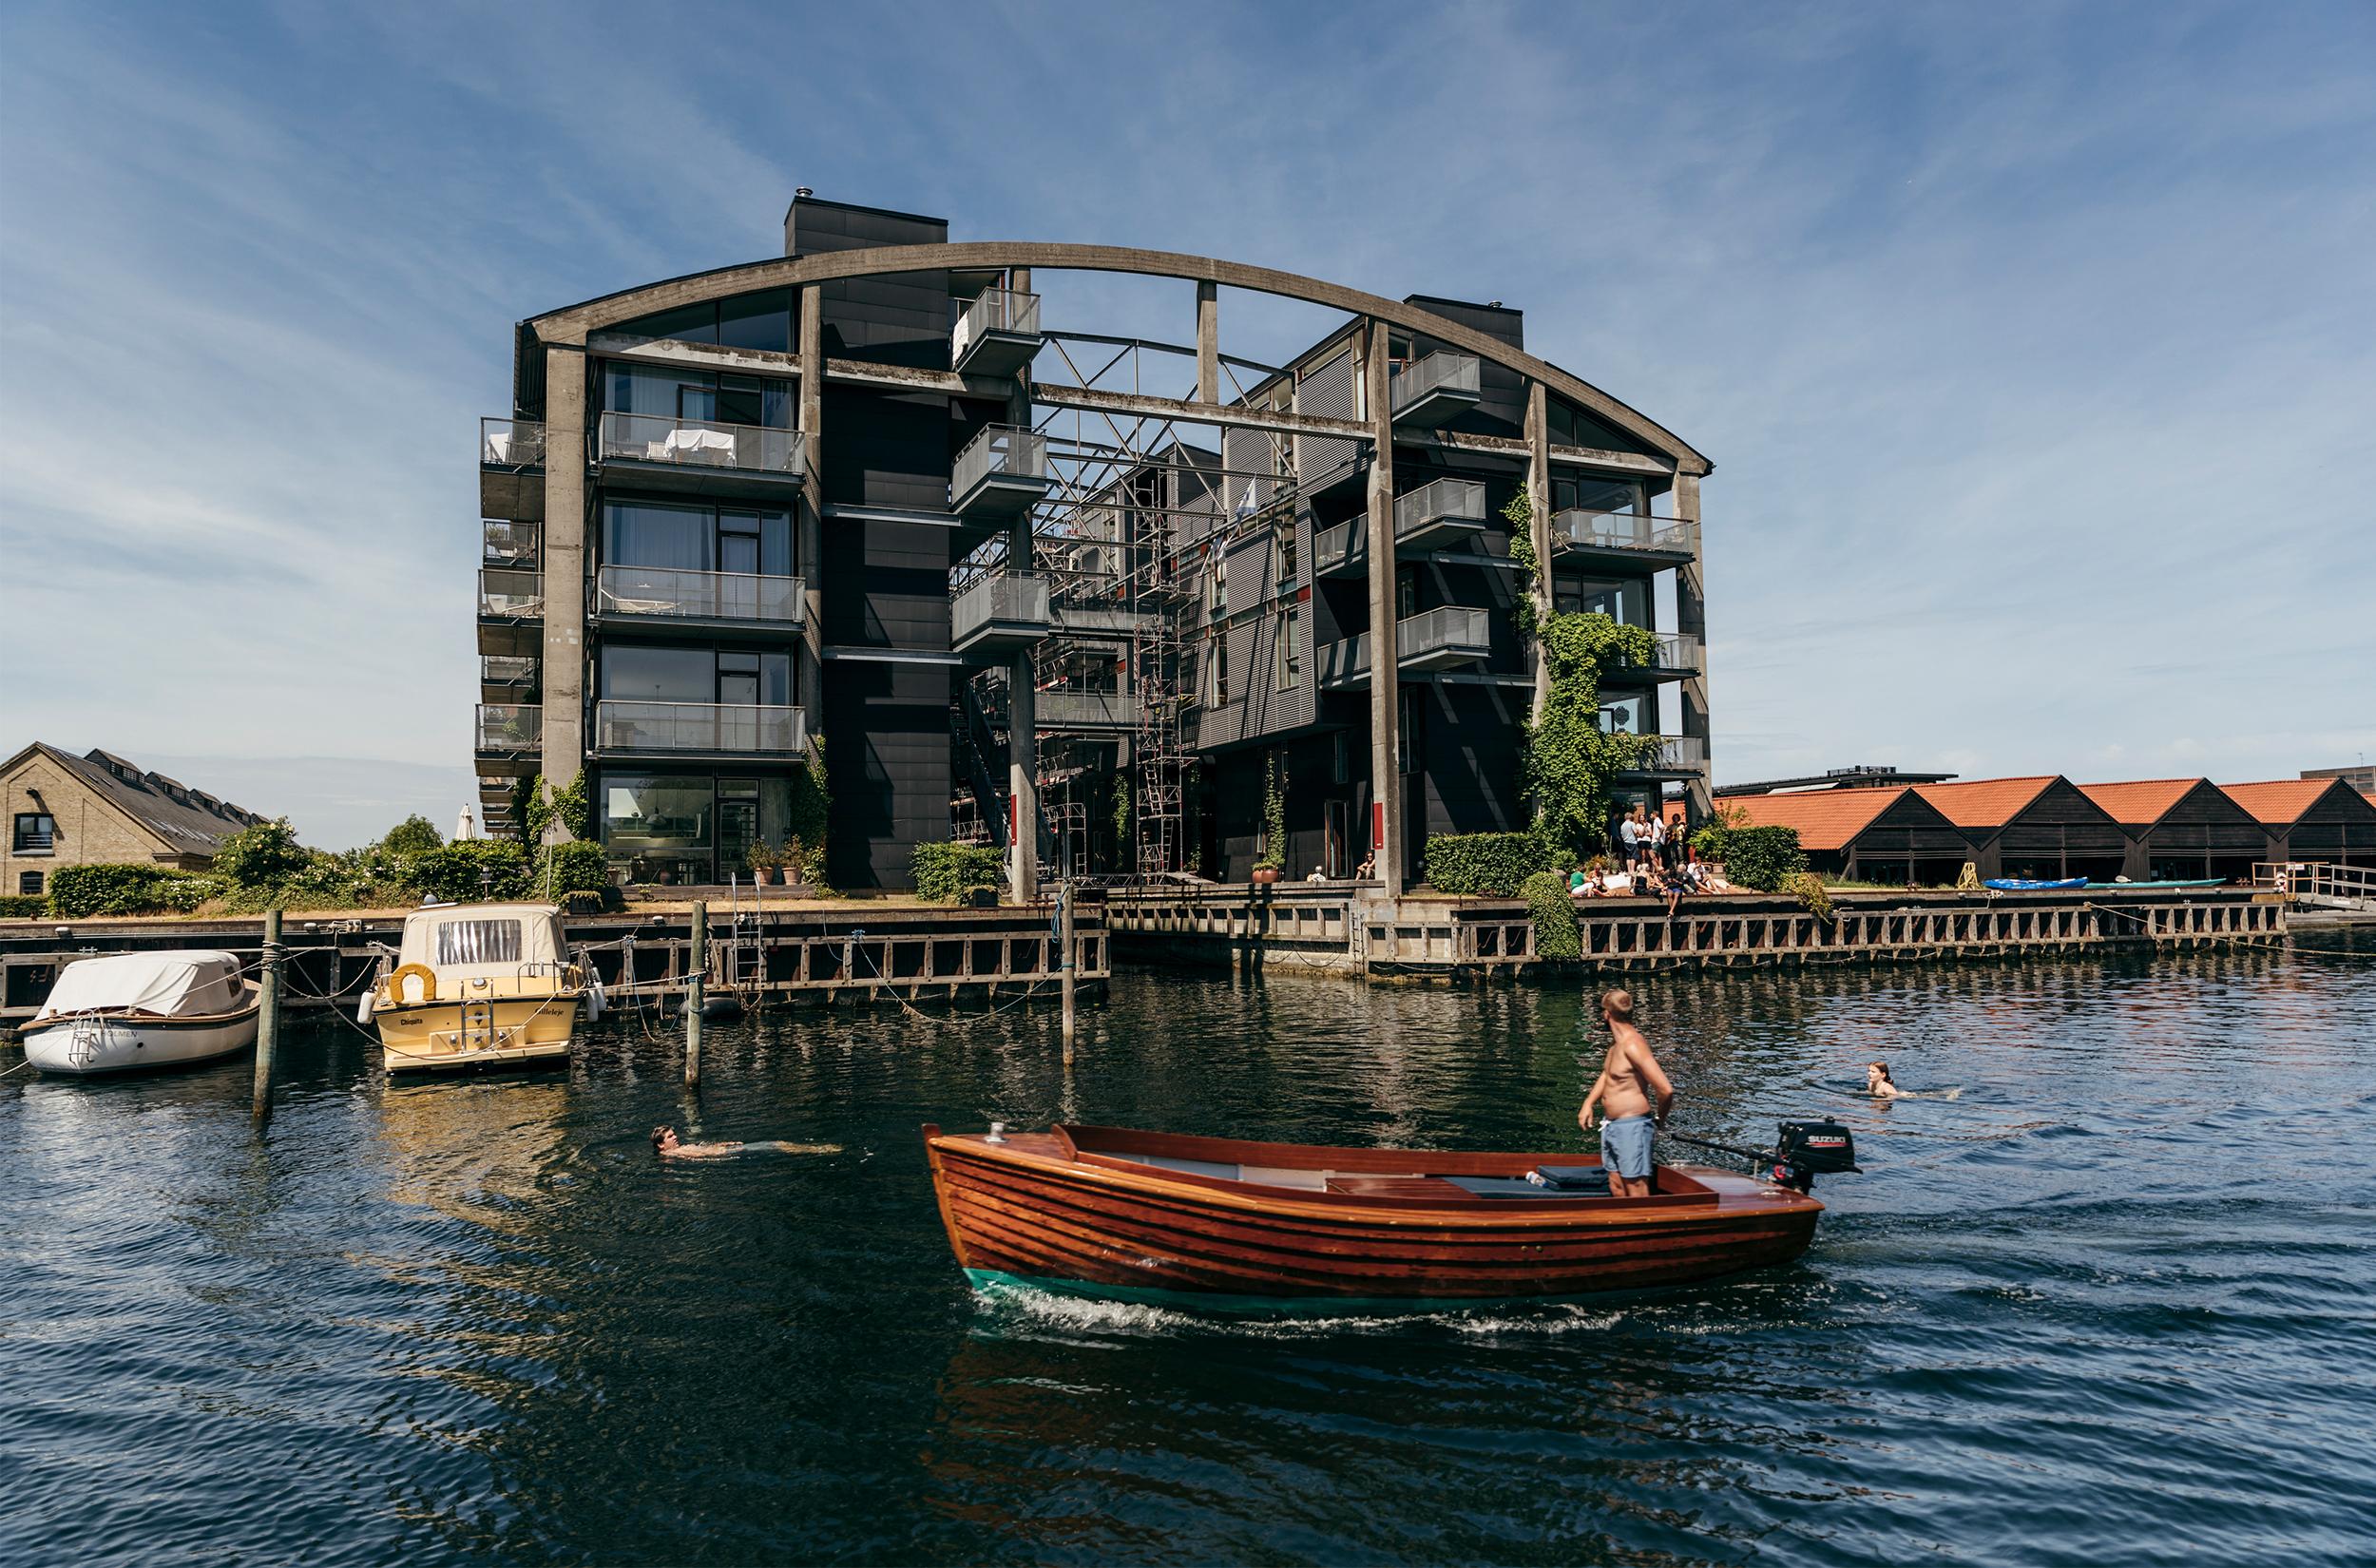 Båd i havnen / Foto: Andreas Raun Arneberg